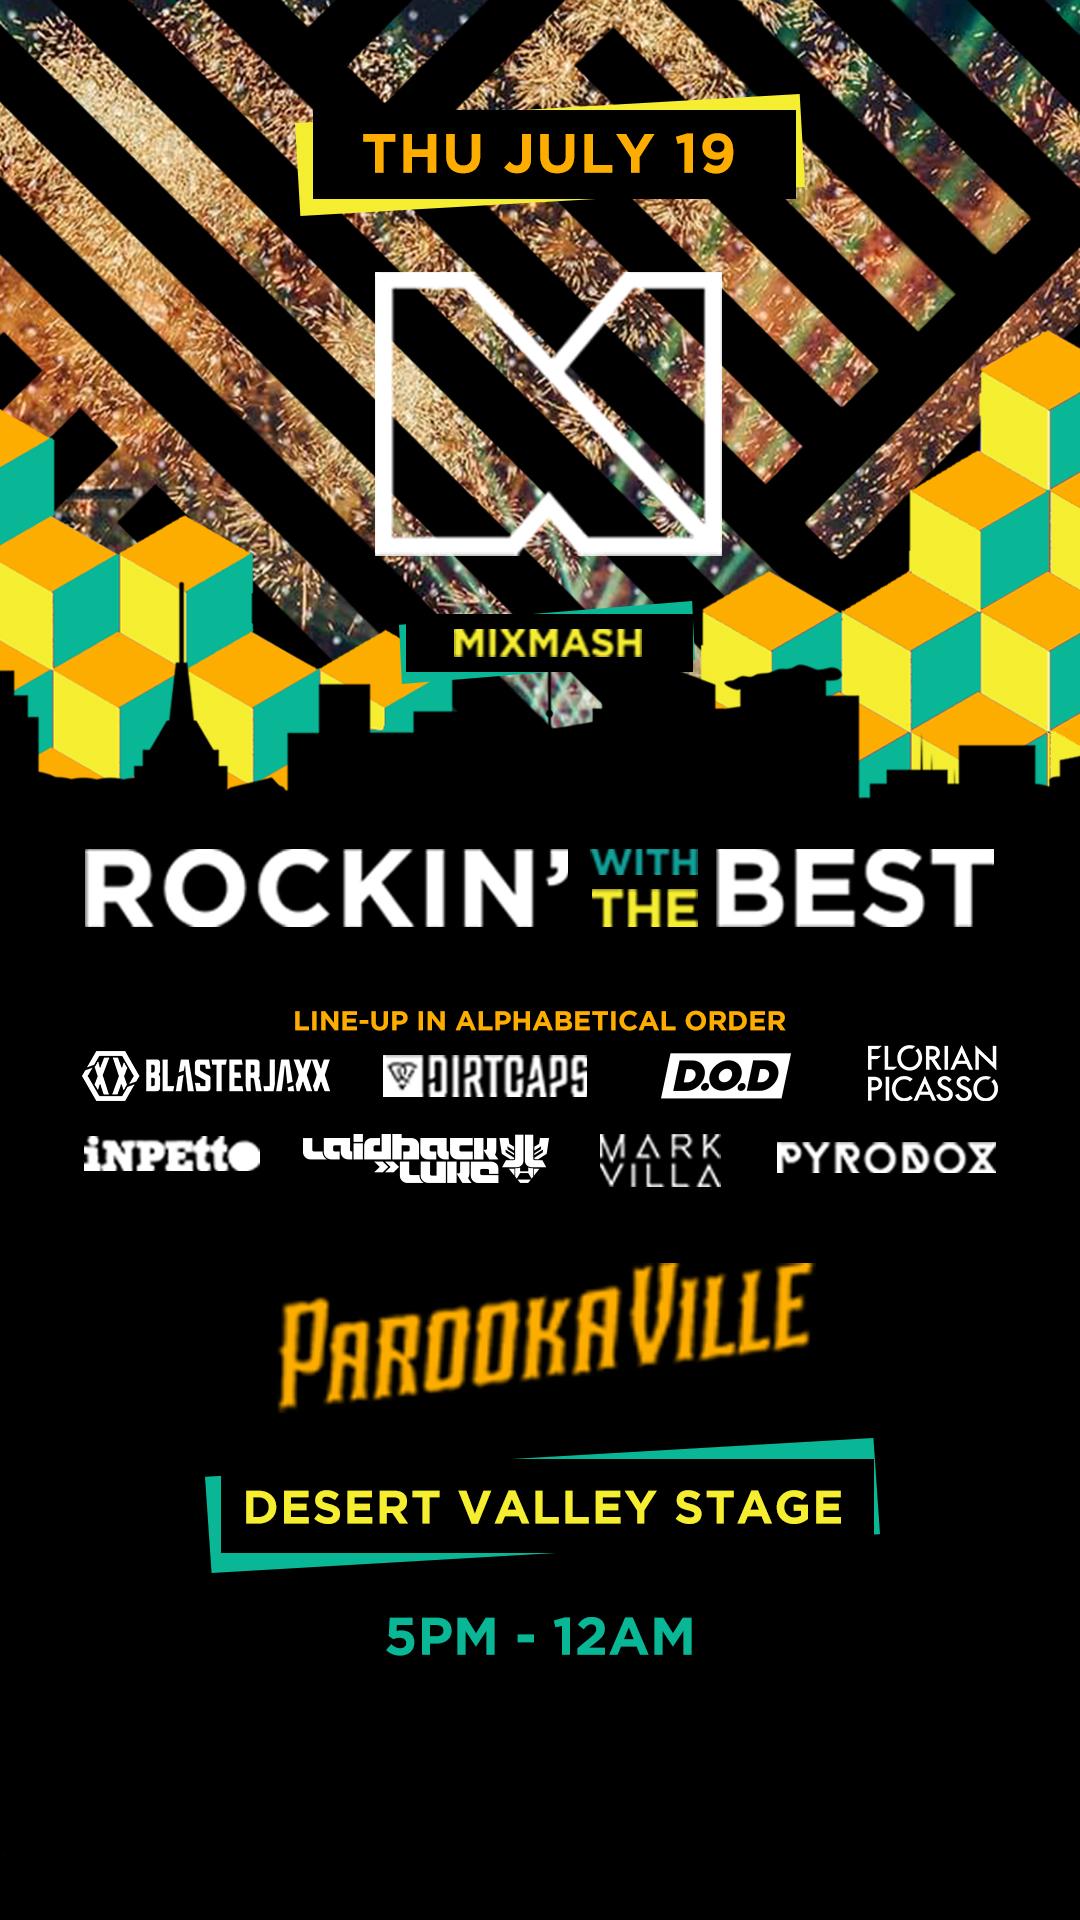 Mixmash @ Parookaville - Desert Valley Stage takeover